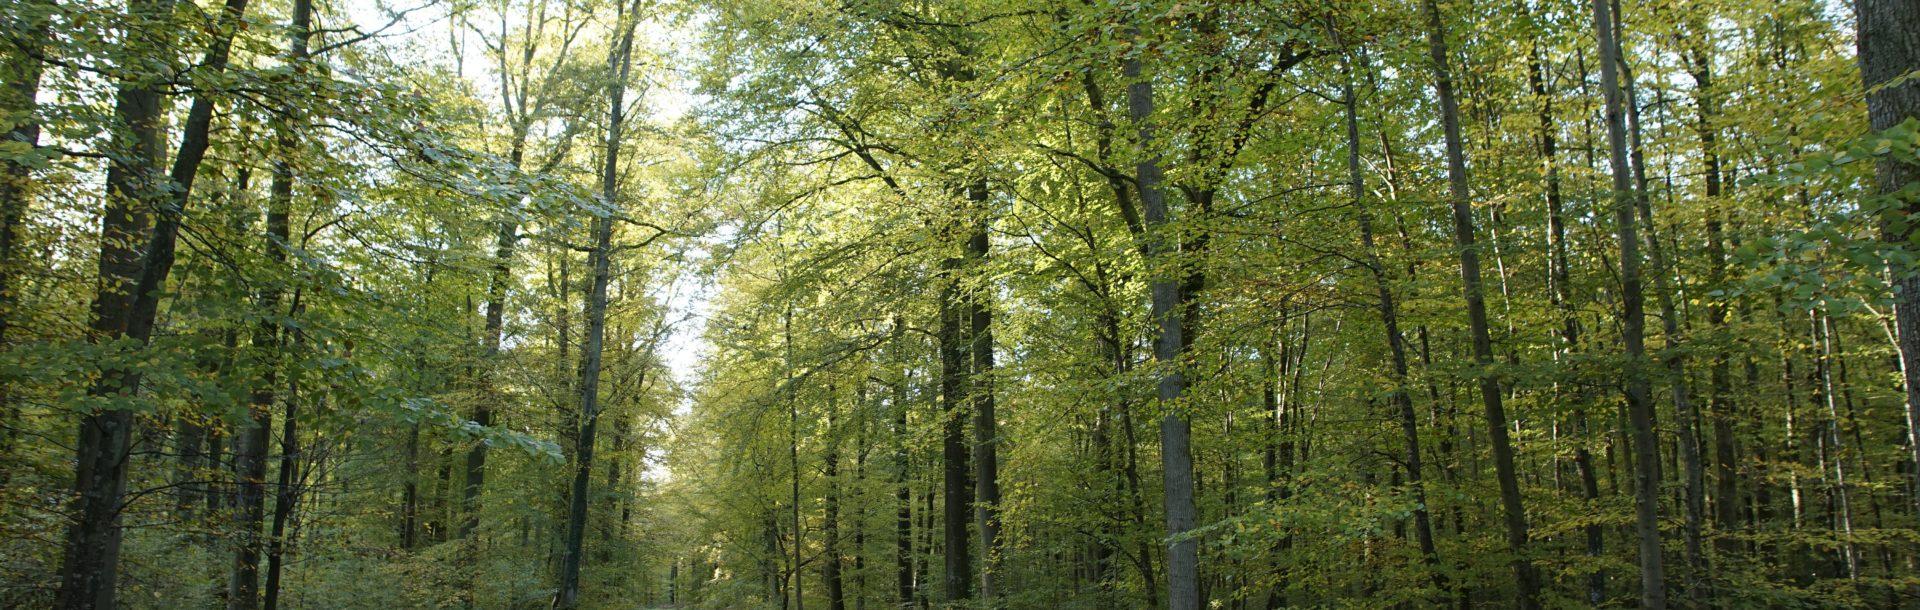 La biodiversité en Normandie